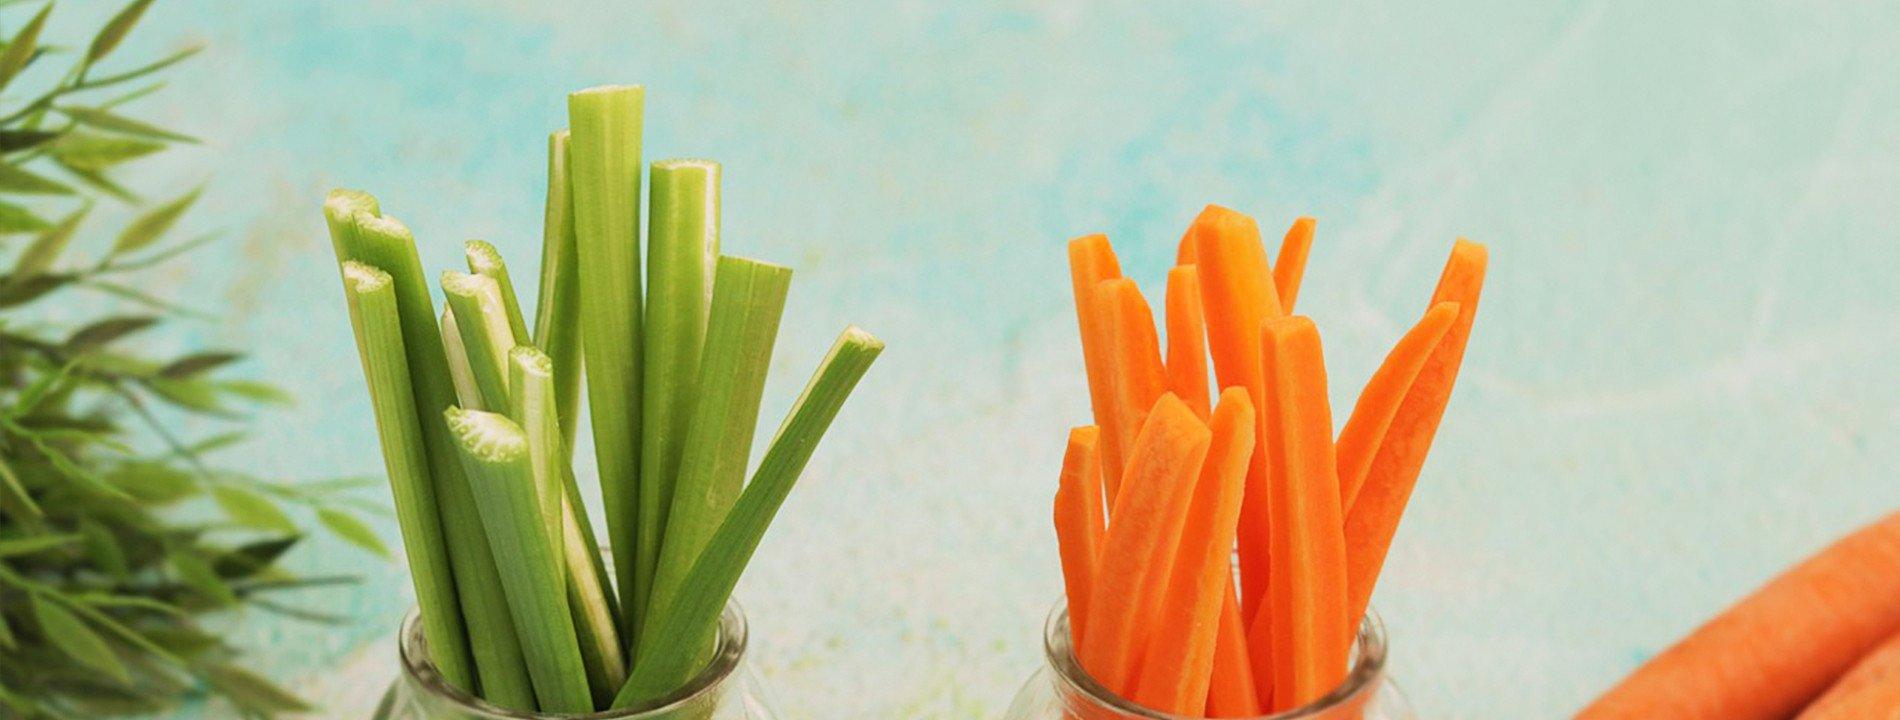 Mix Celery and Carrot Sticks